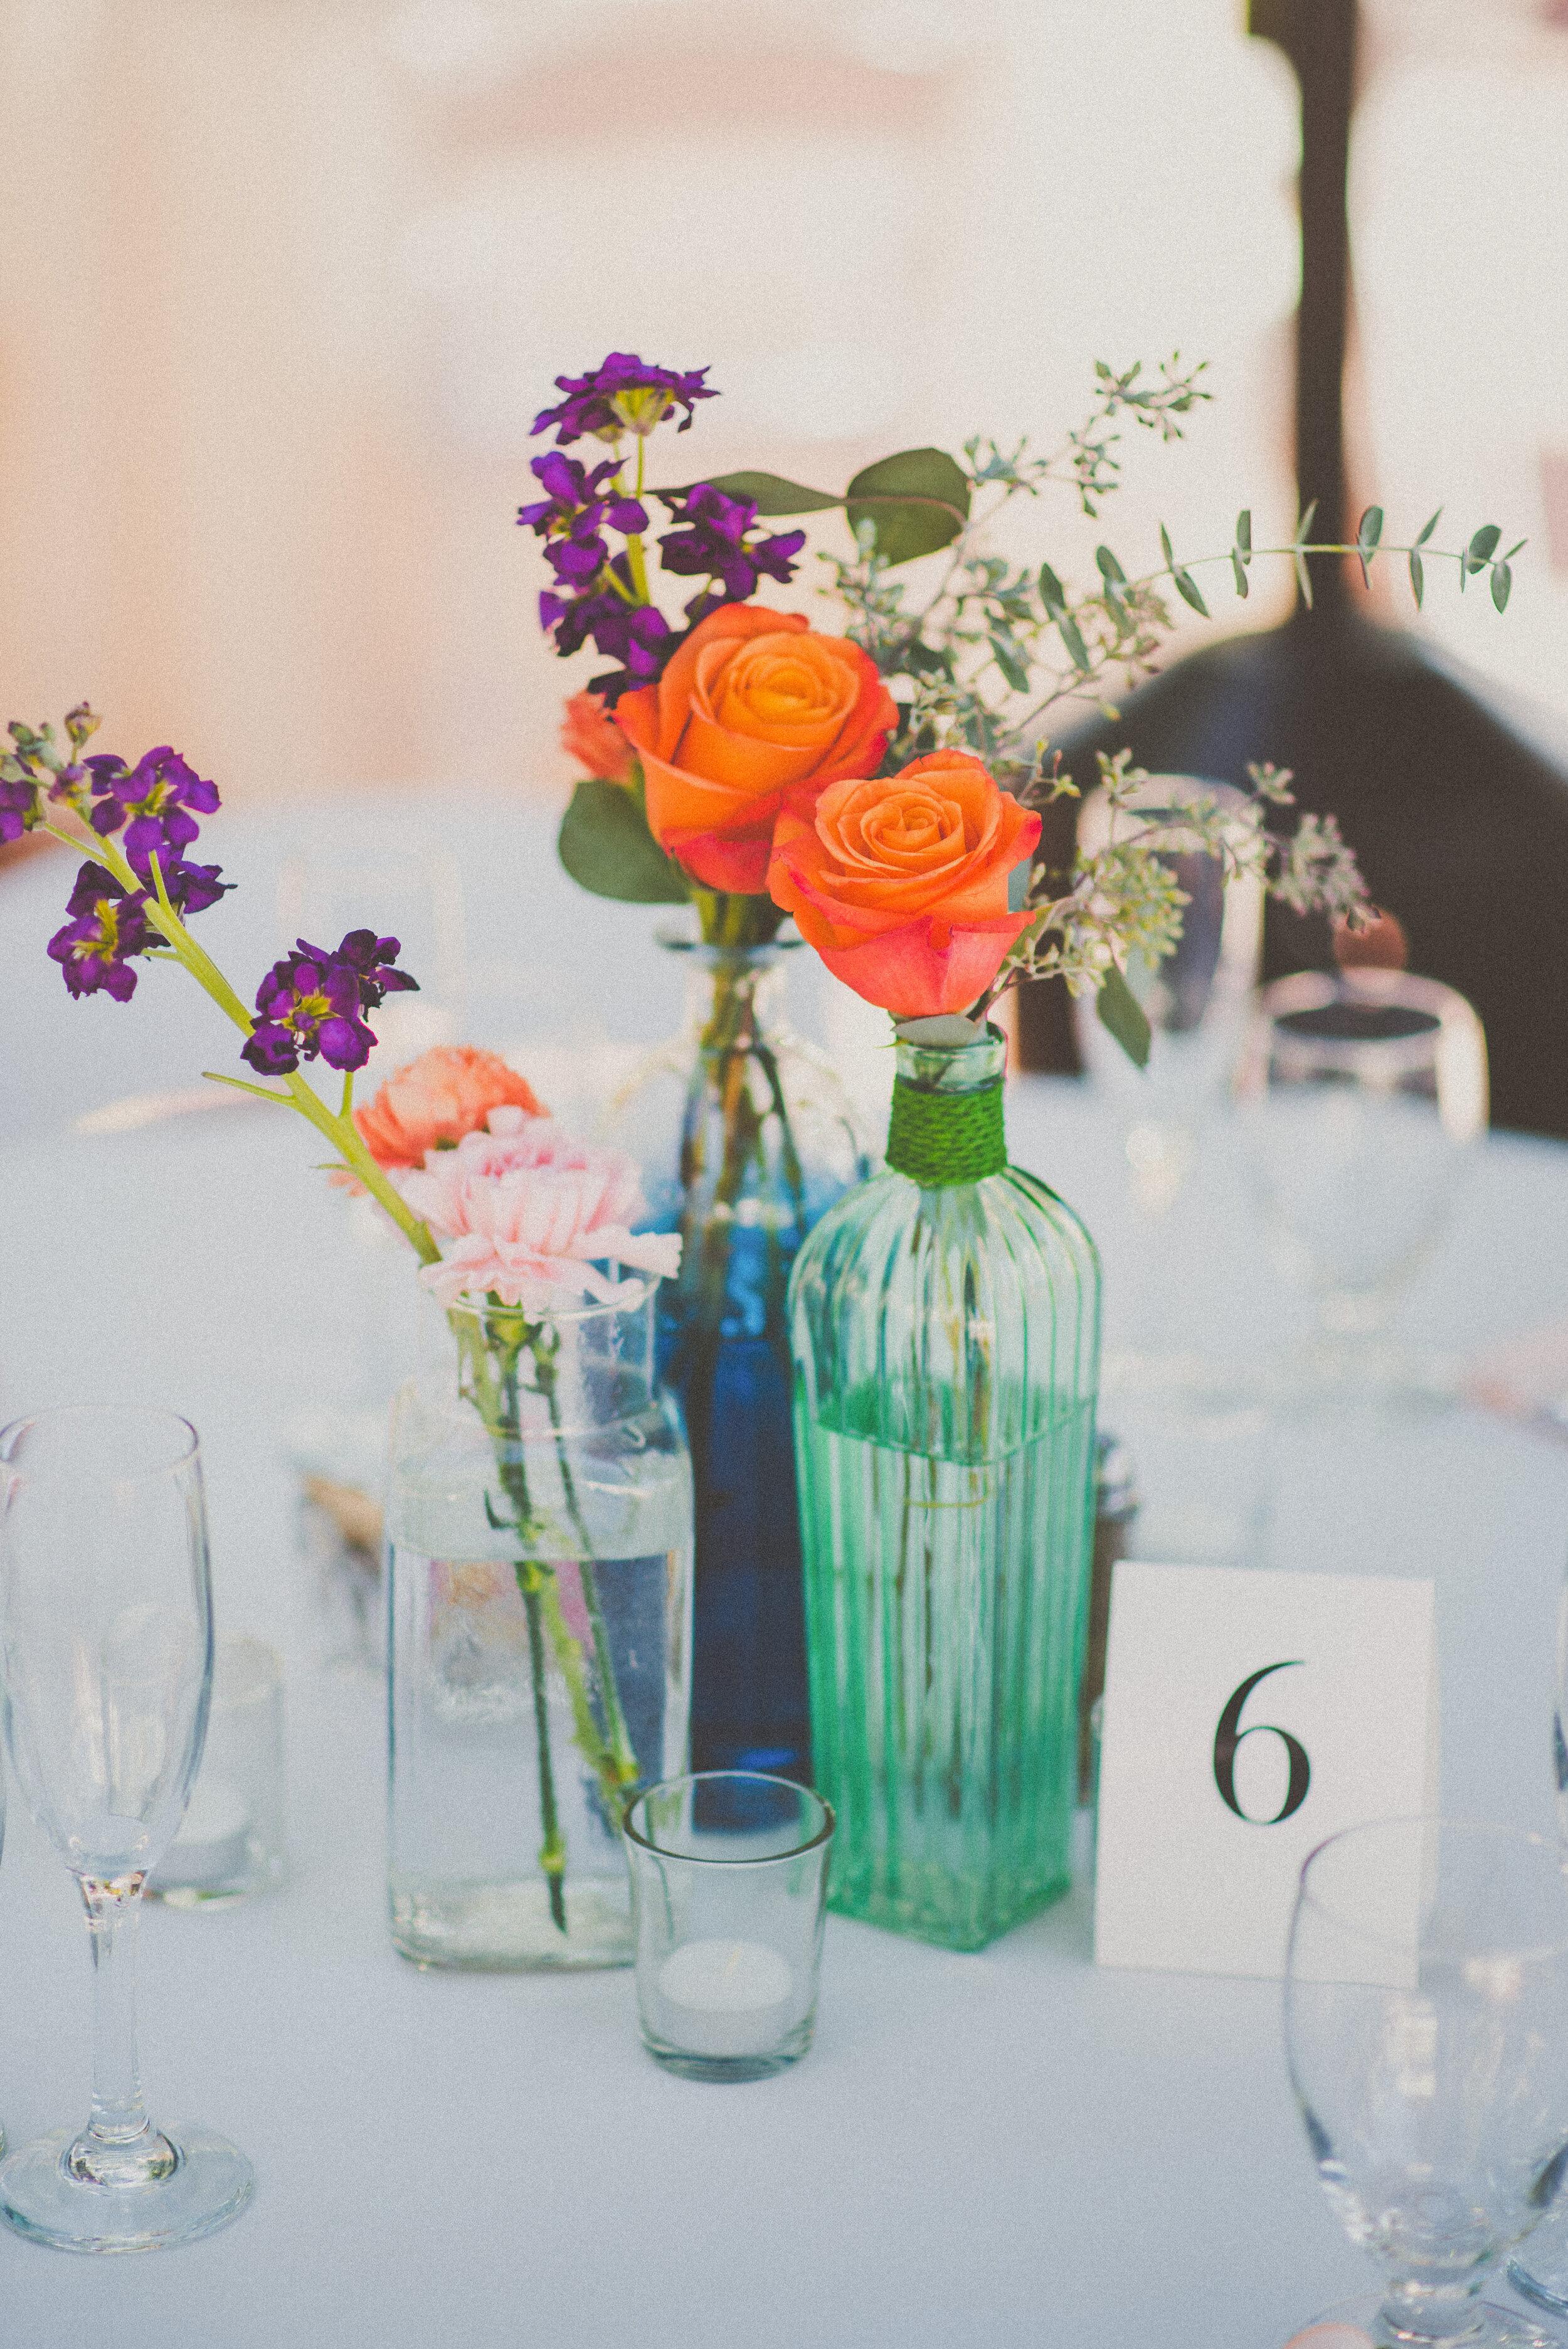 Herrera Wedding - Reception-26.jpg